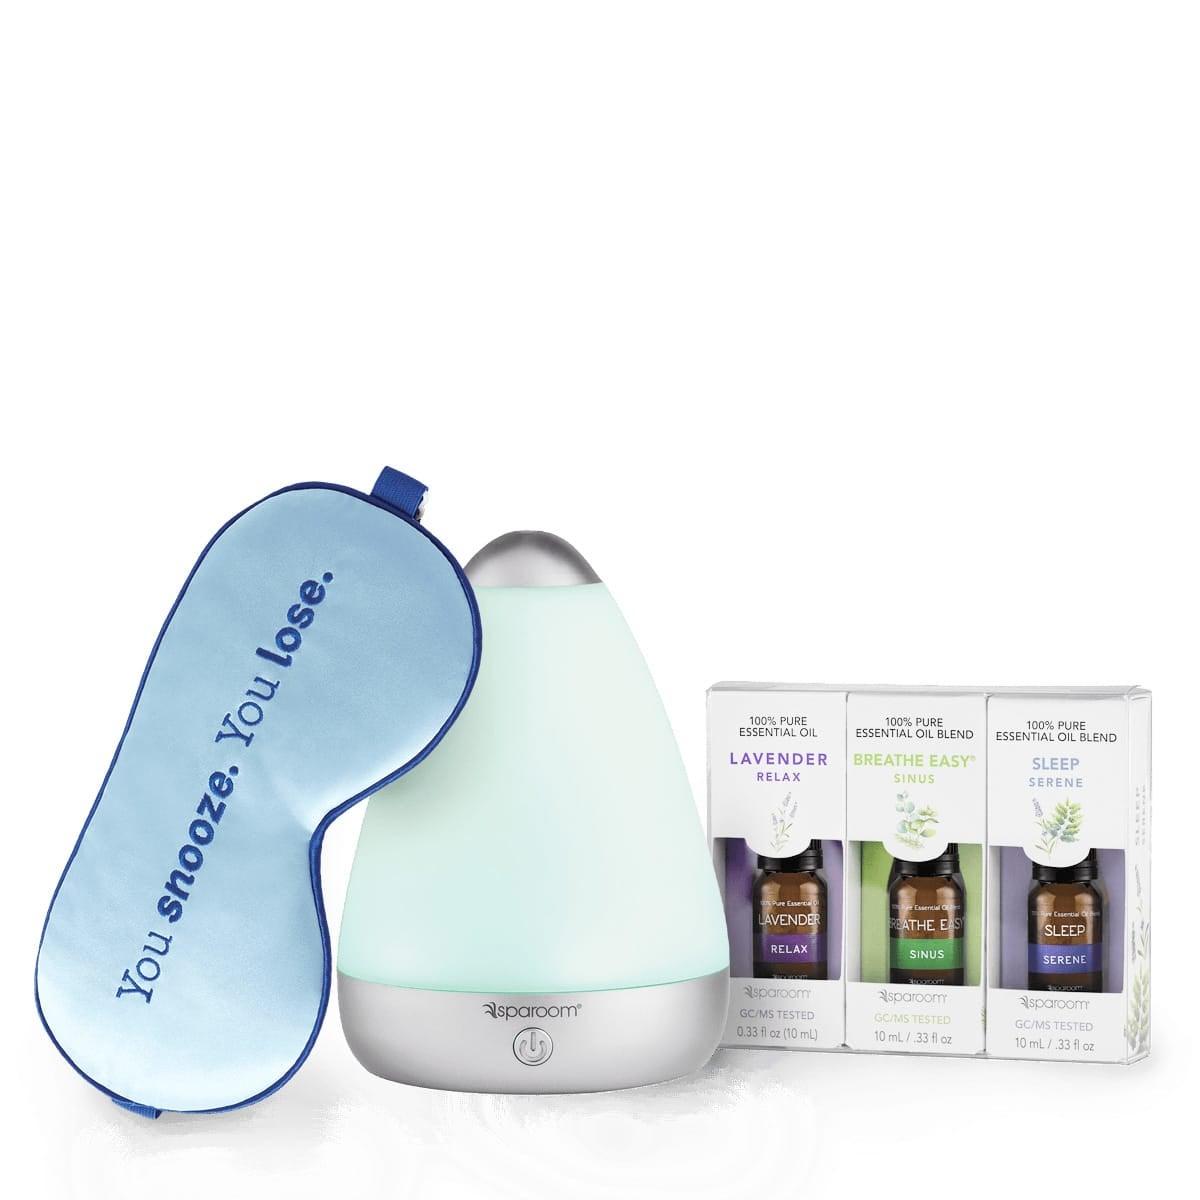 Sleep Soundly Bundle - eye mask, essential oil, diffuser set